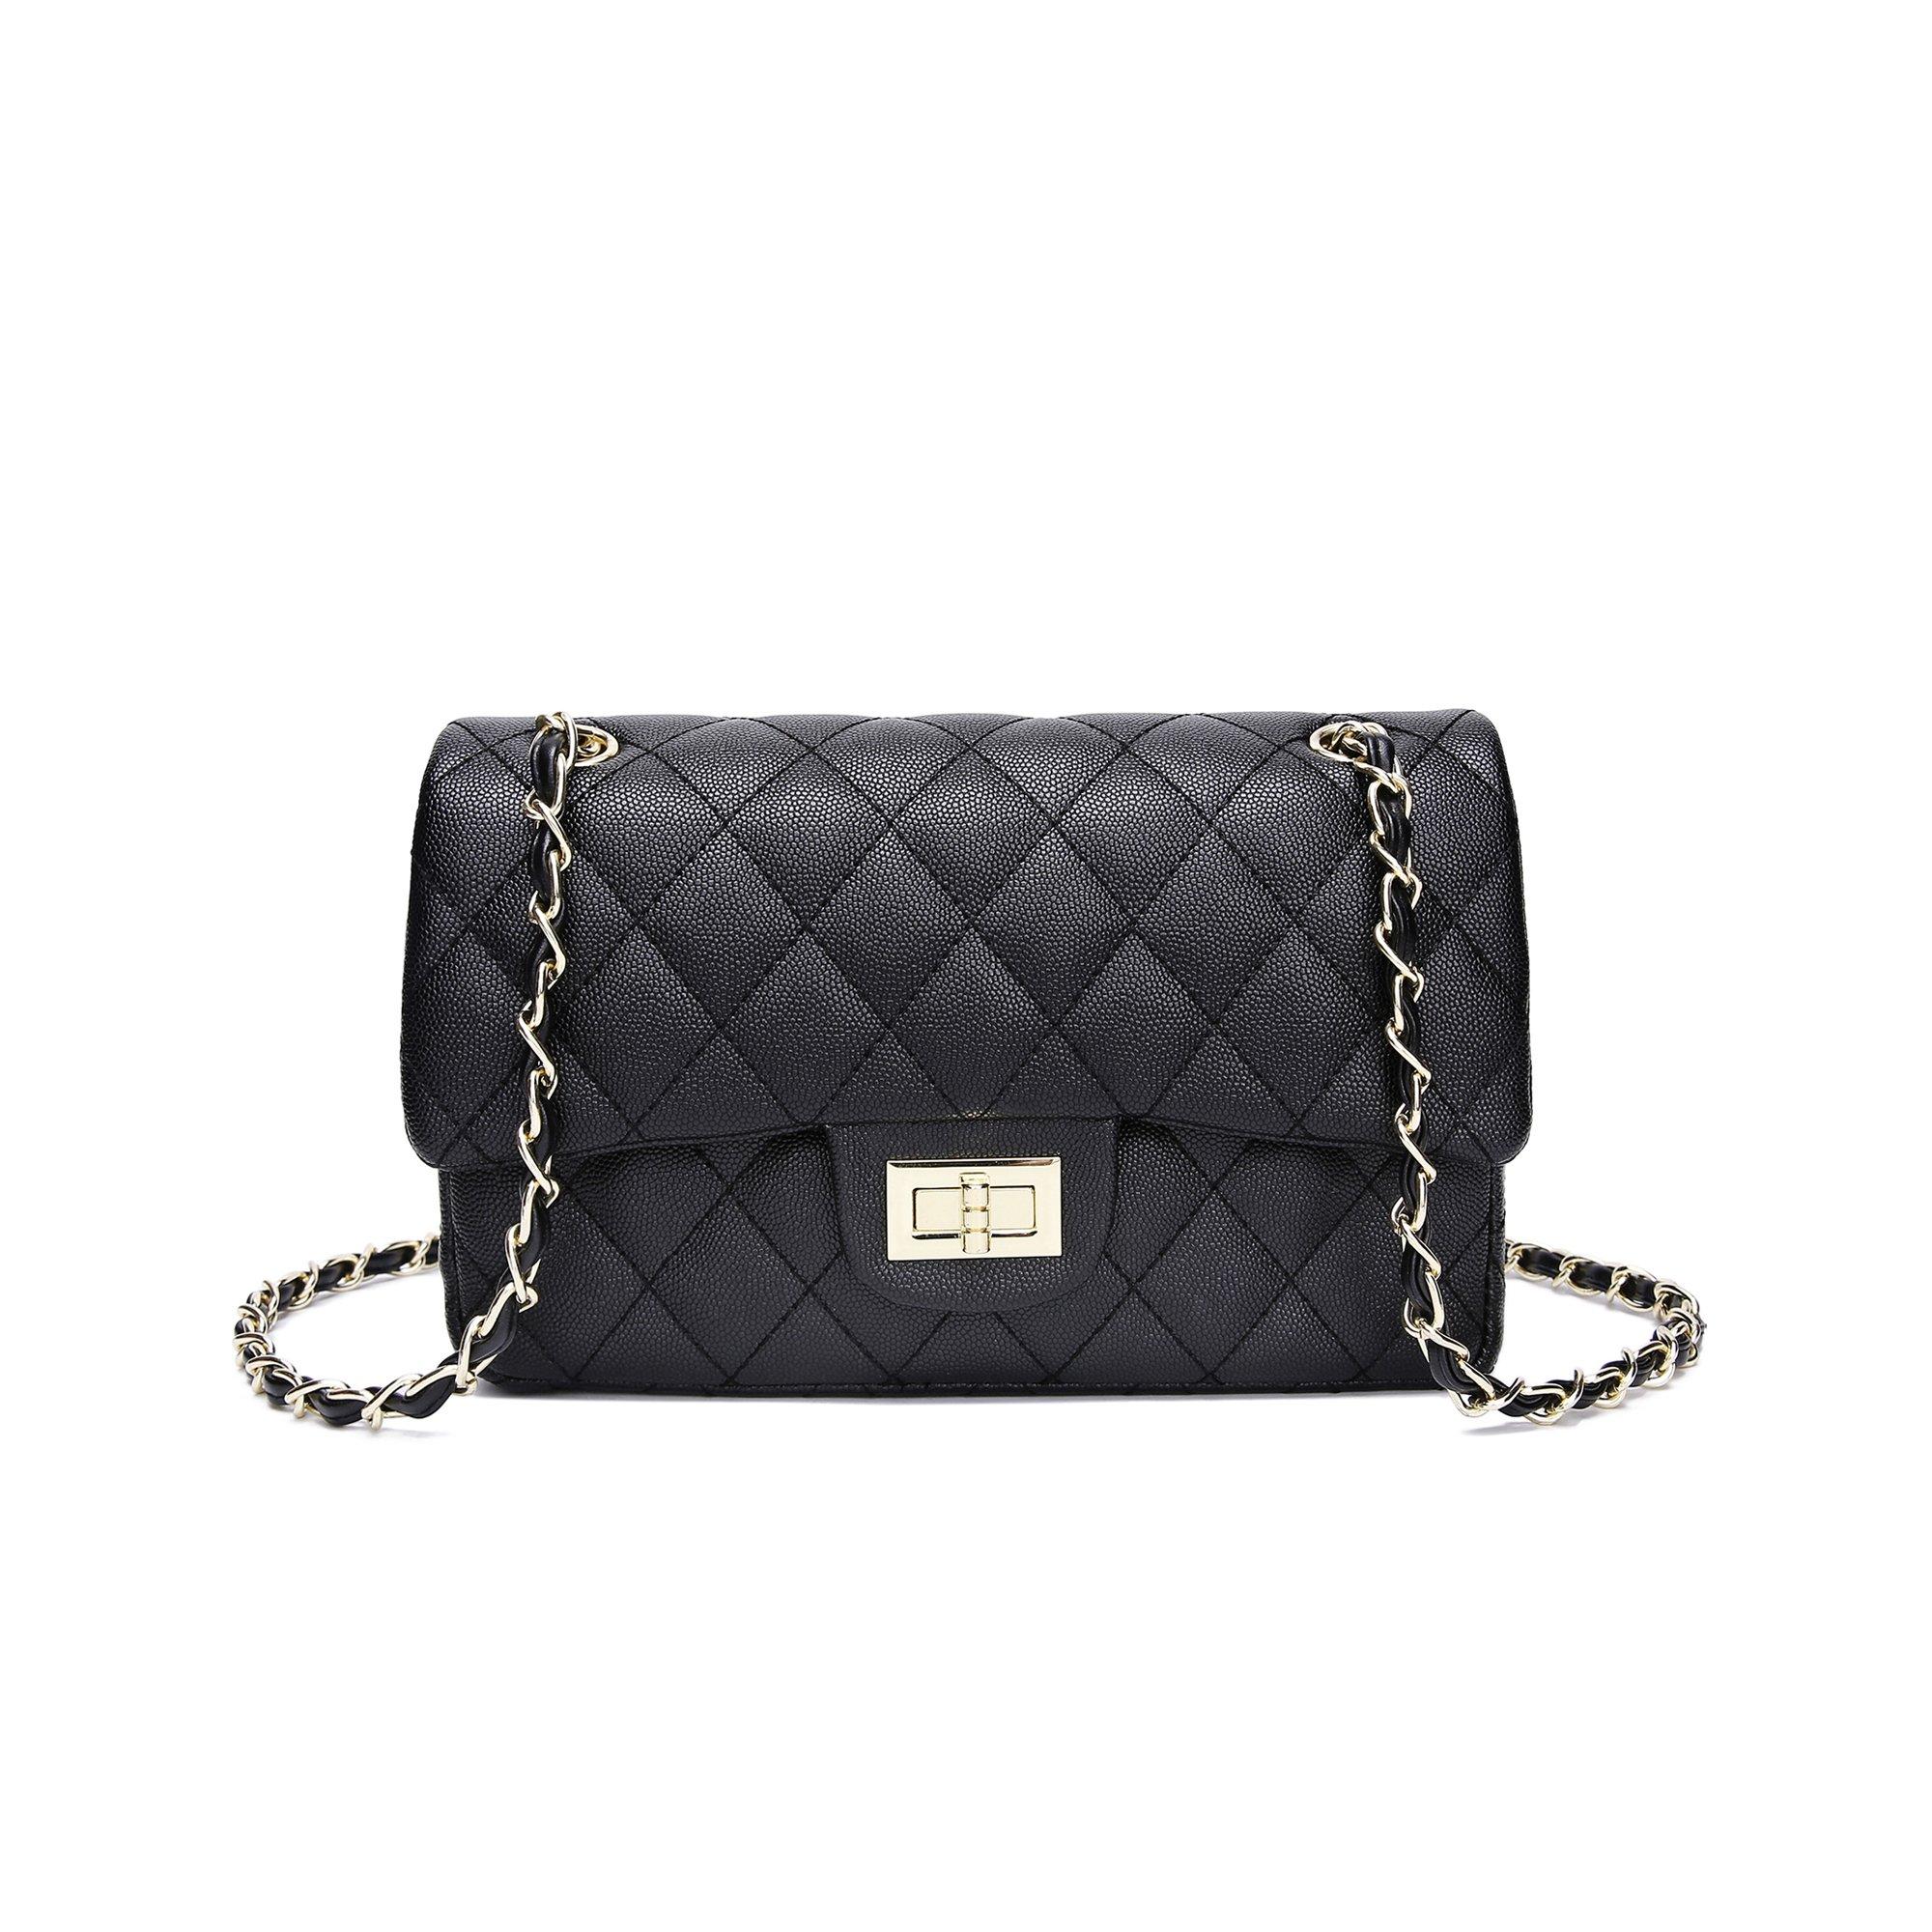 Jollque Classic Flap Caviar Leather Gold Hardware Crossbody Shoulder Bag (Black (Medium))